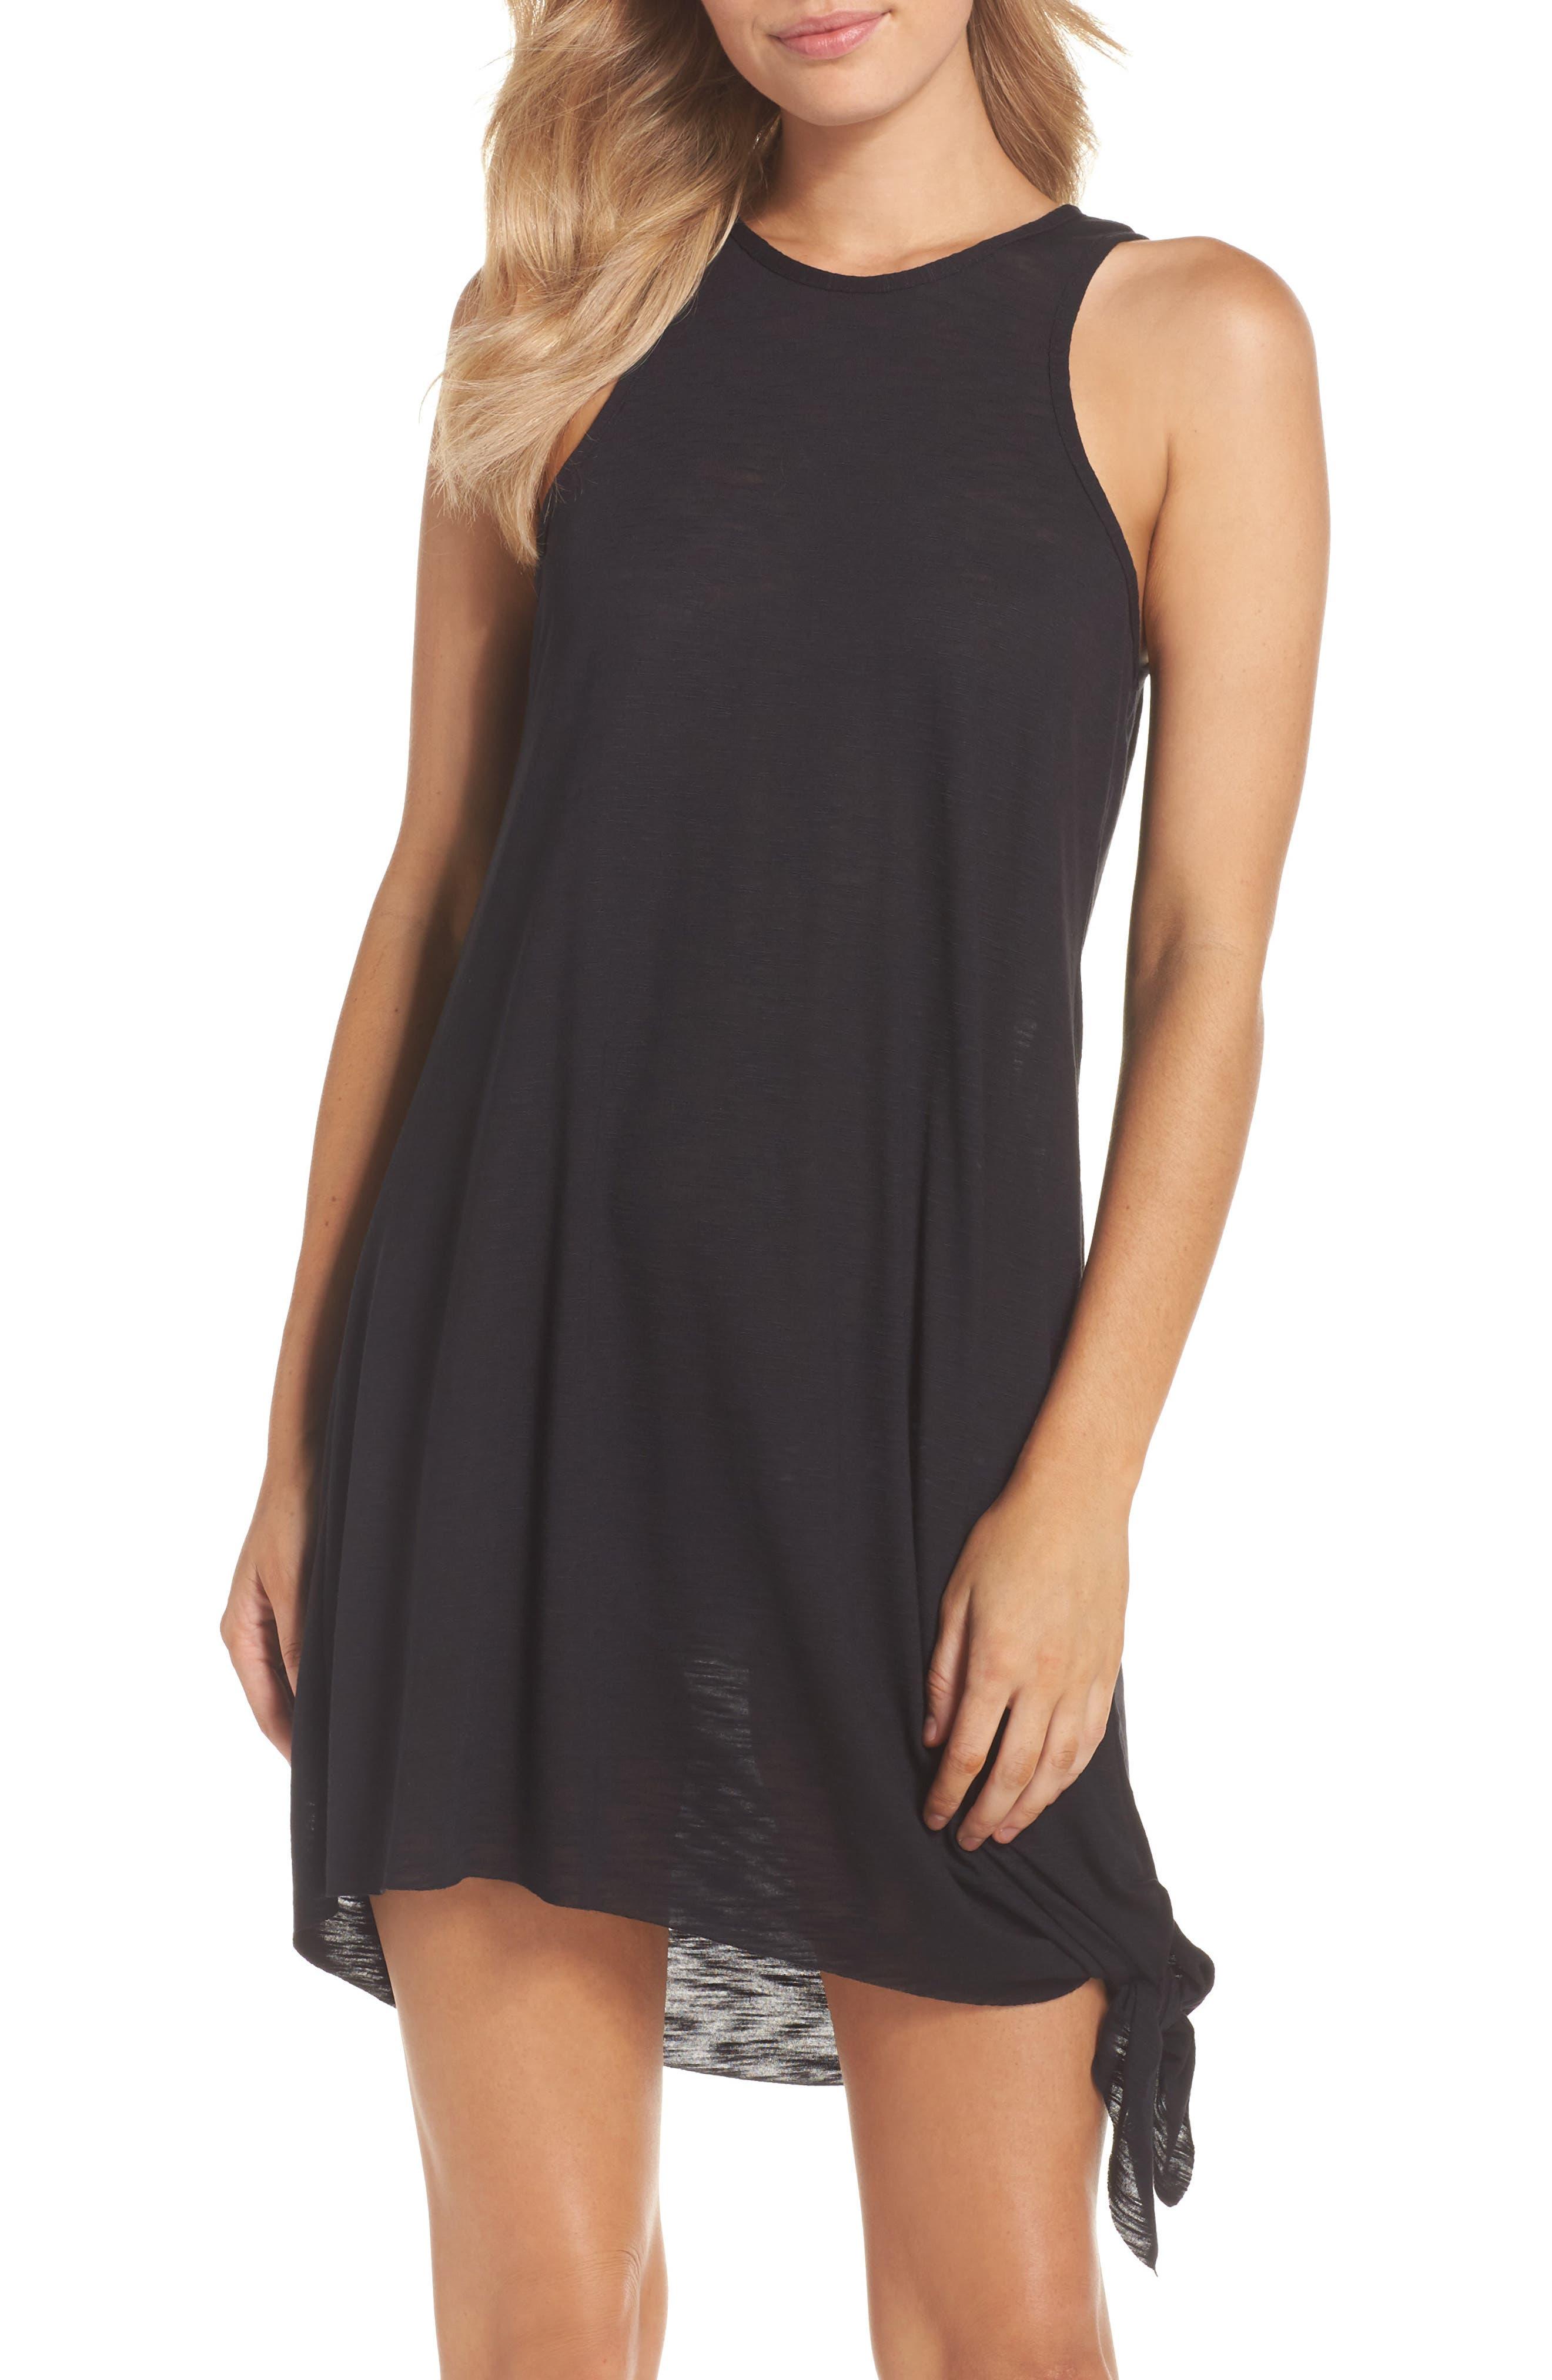 BECCA Breezy Basics Cover-Up Dress, Main, color, BLACK